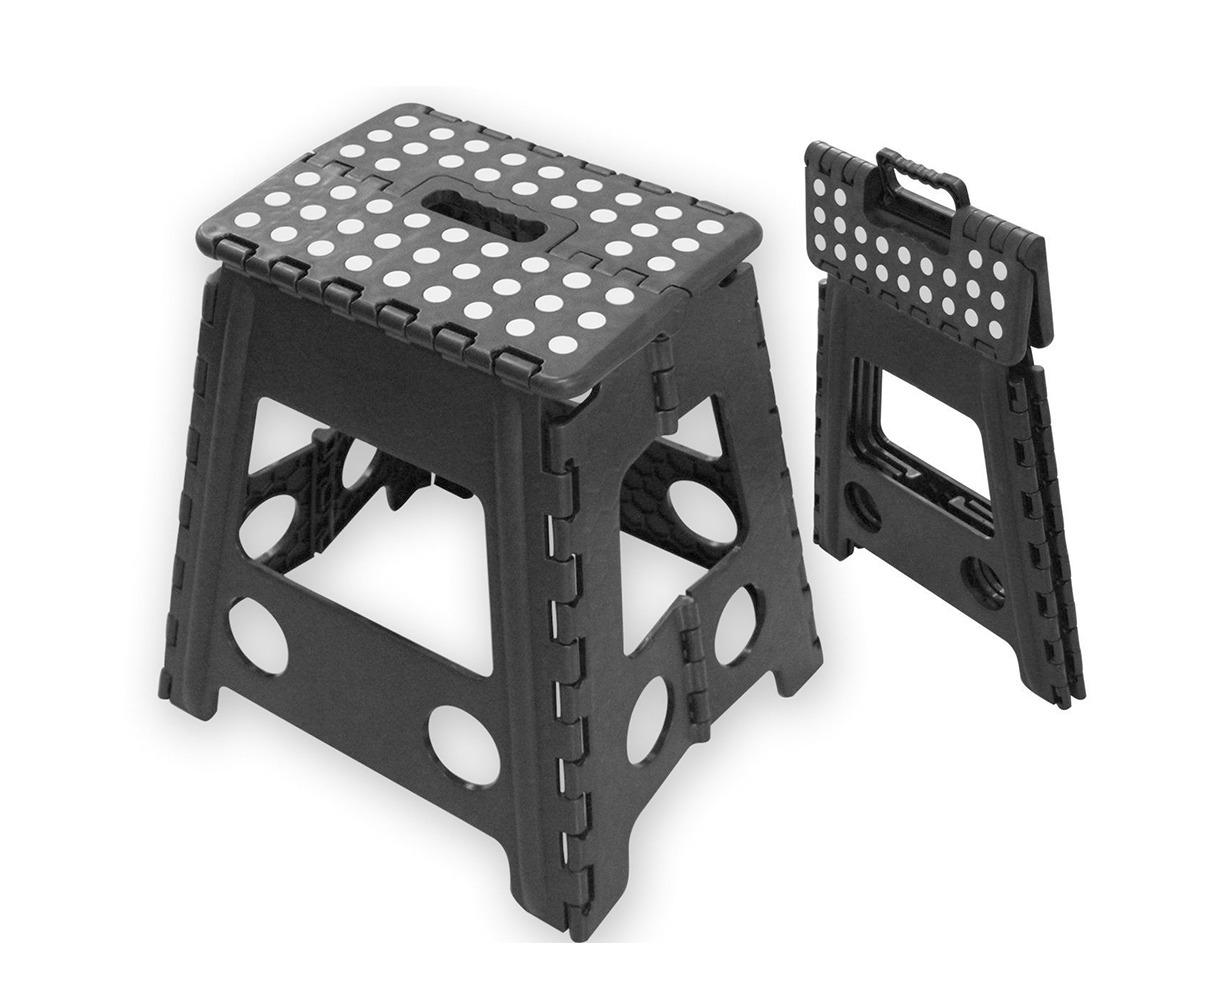 Folding Step Stool Portable Plastic Foldable Chair Store